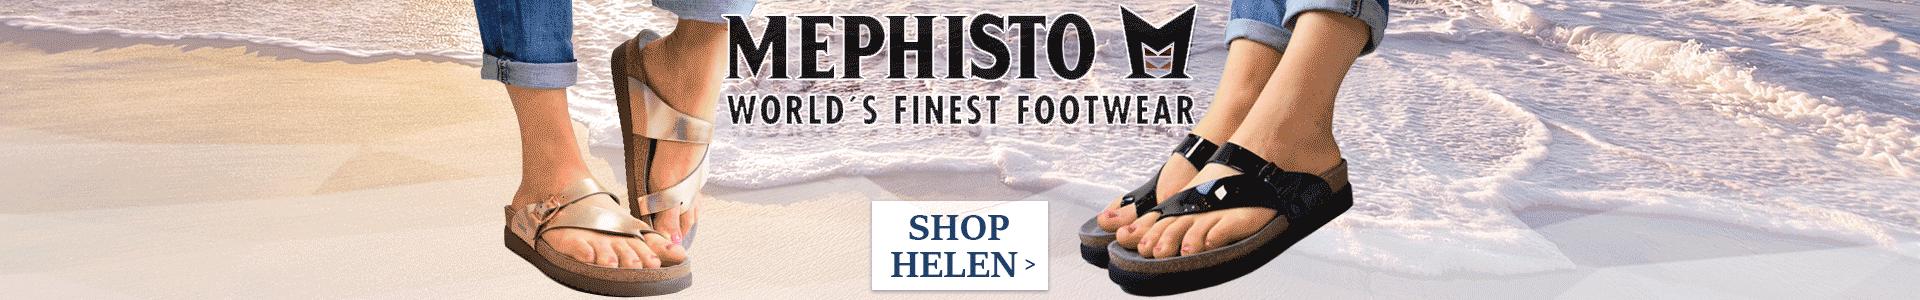 Shop Mephisto Helen